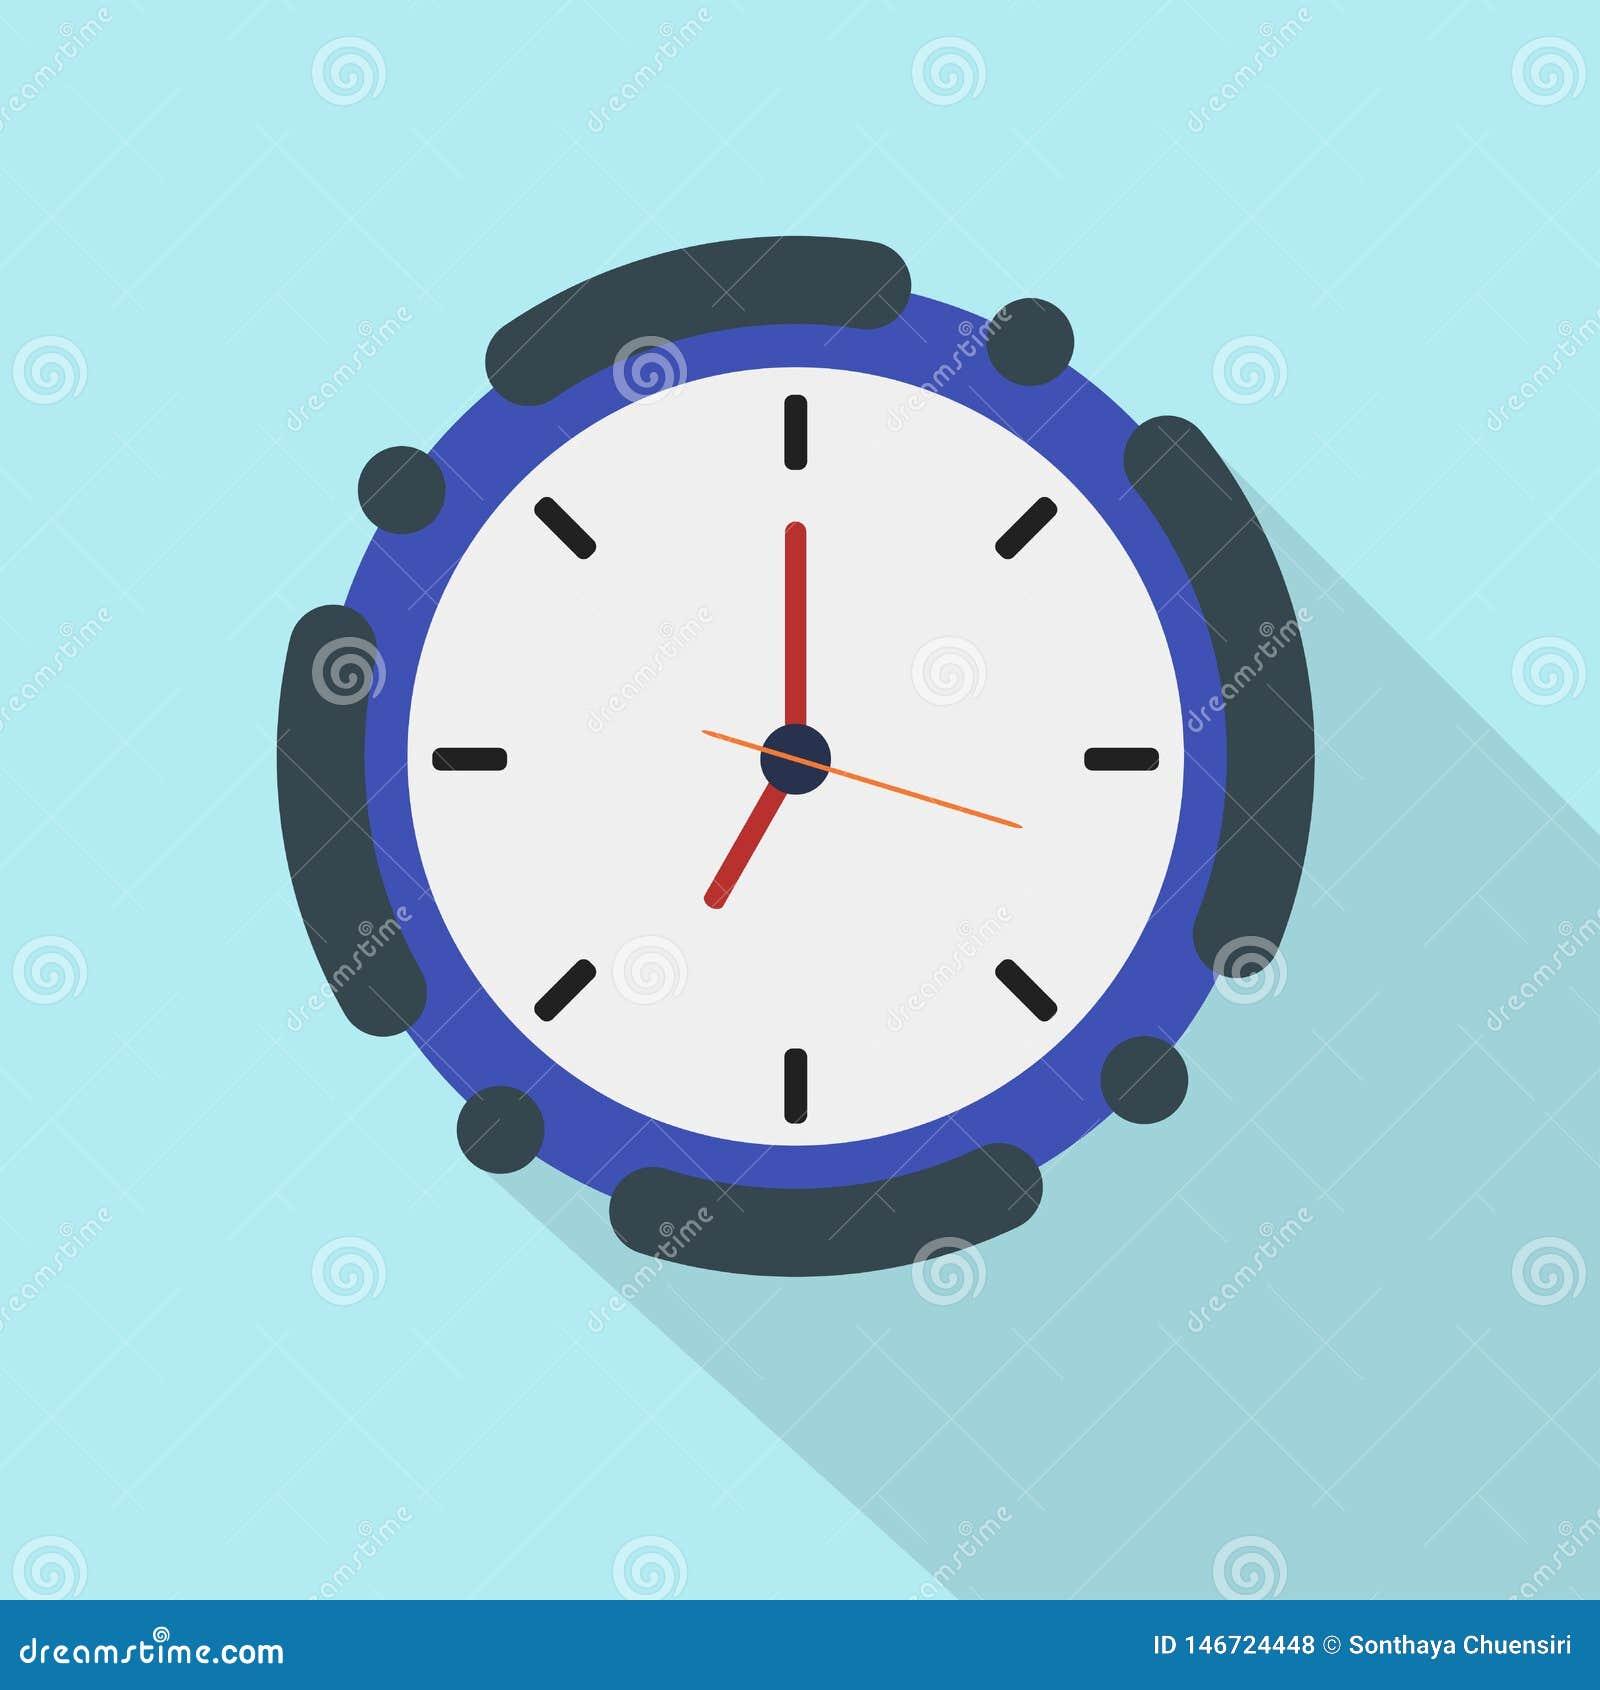 Flat icon clock on blue background